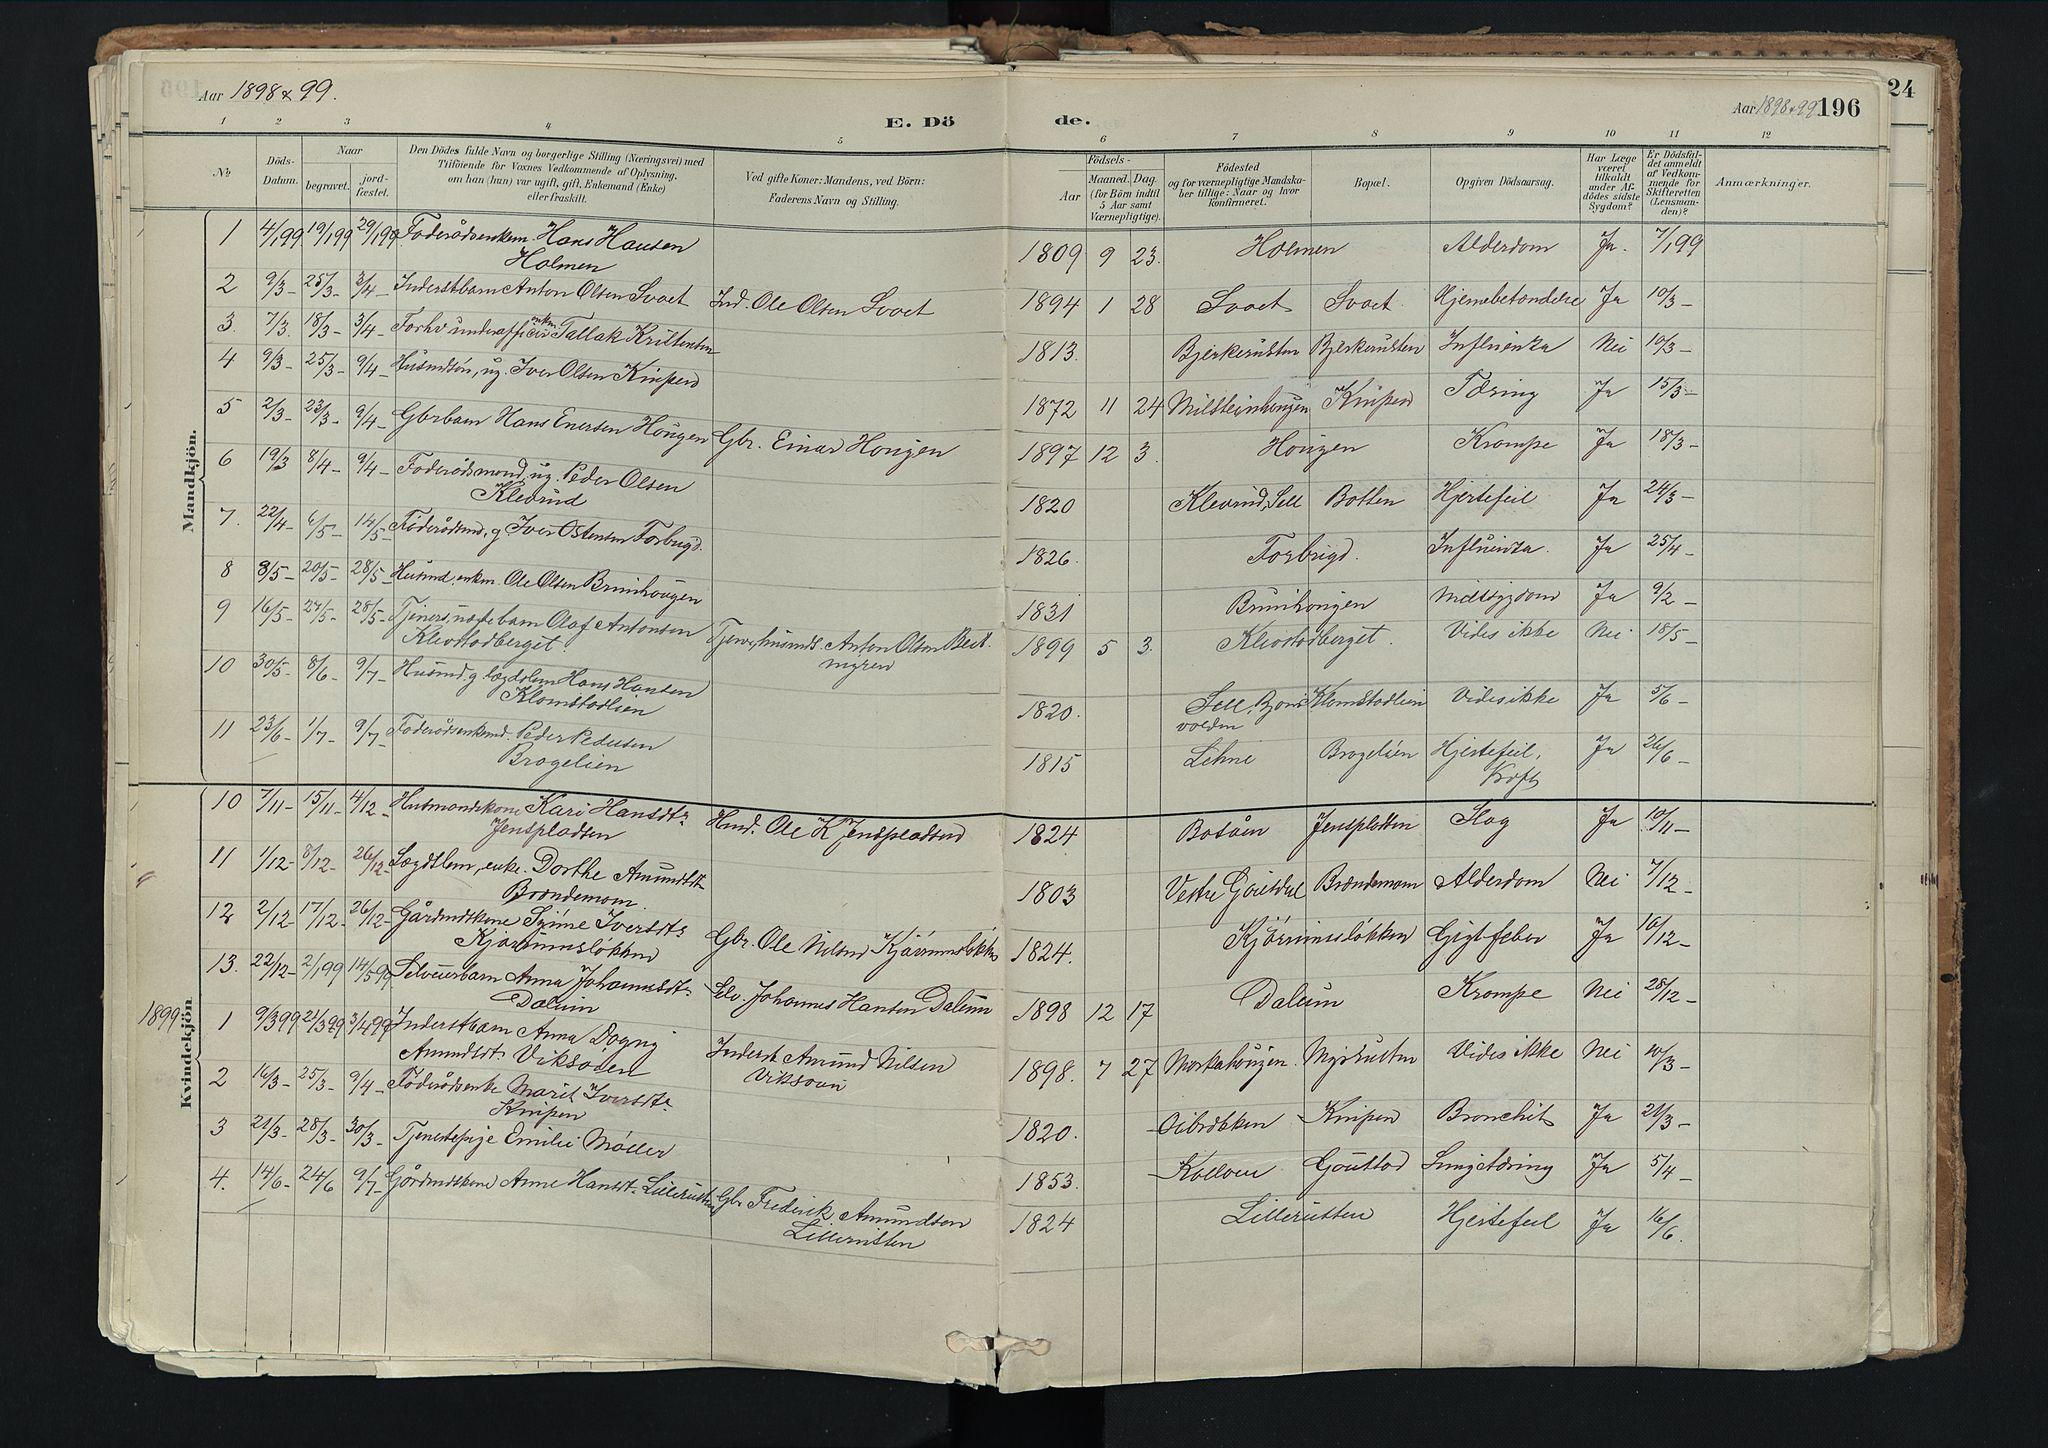 SAH, Nord-Fron prestekontor, Ministerialbok nr. 3, 1884-1914, s. 196